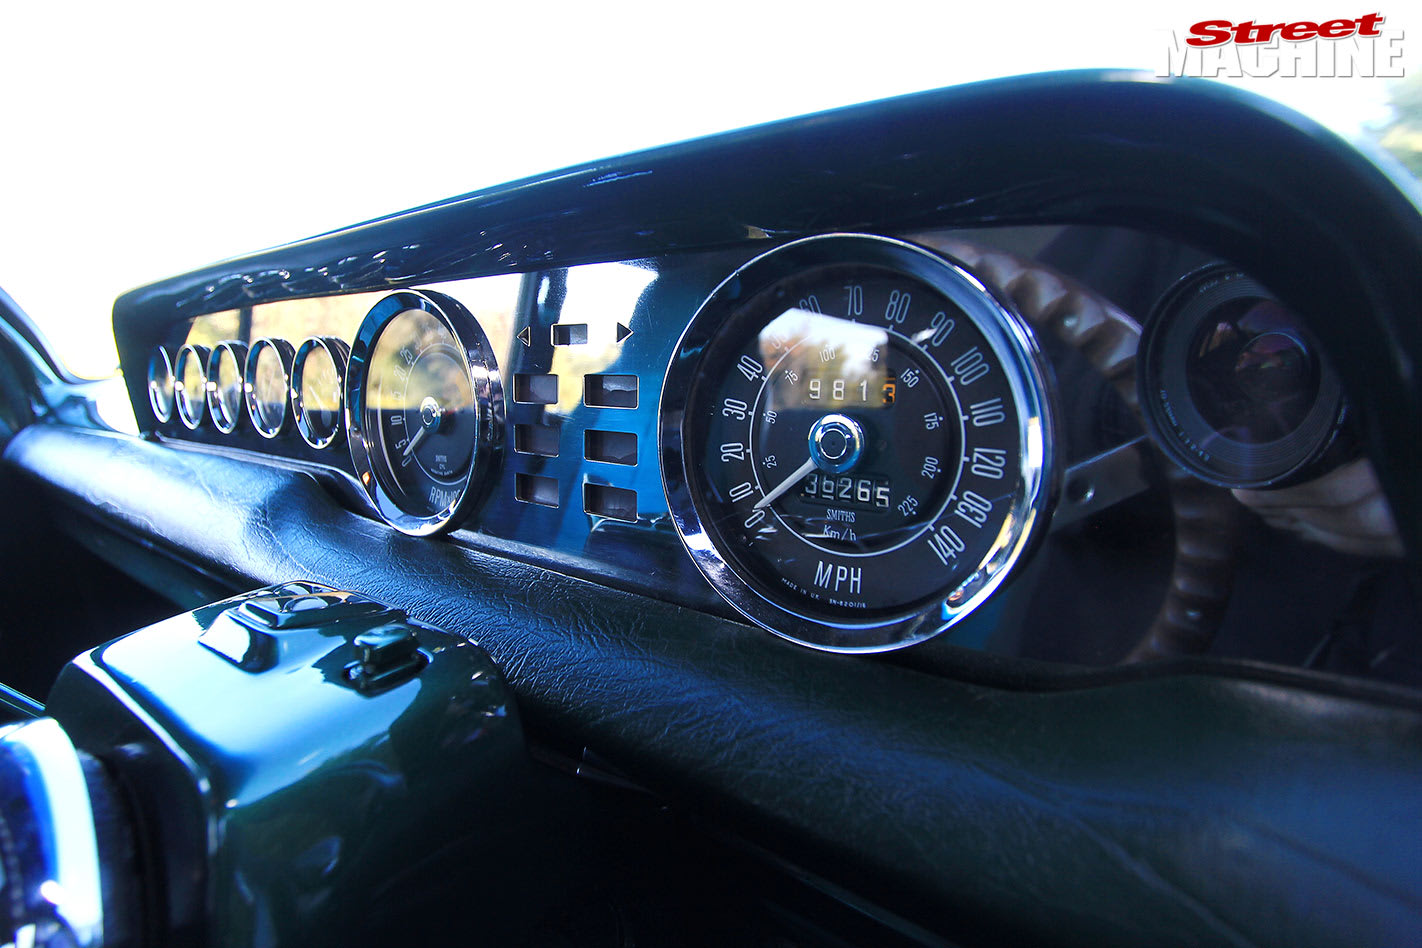 Holden EH wagon dash